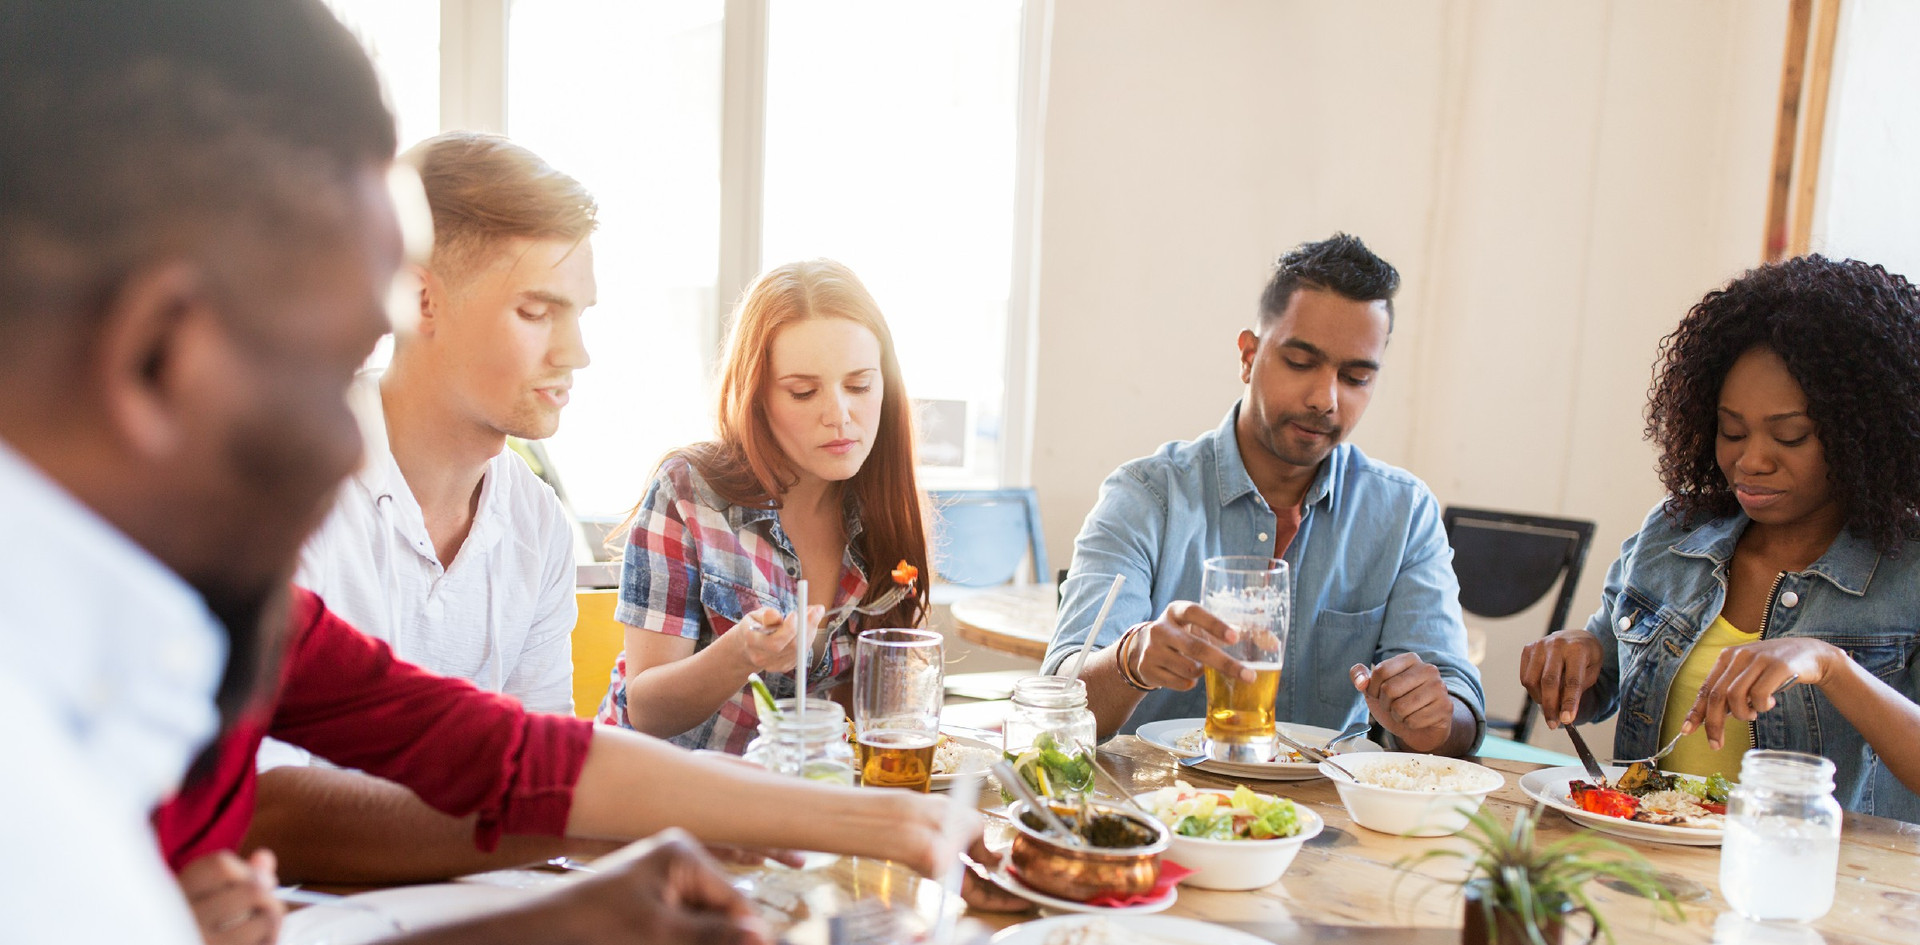 friends-eating-at-restaurant-PB2JMX8.jpg